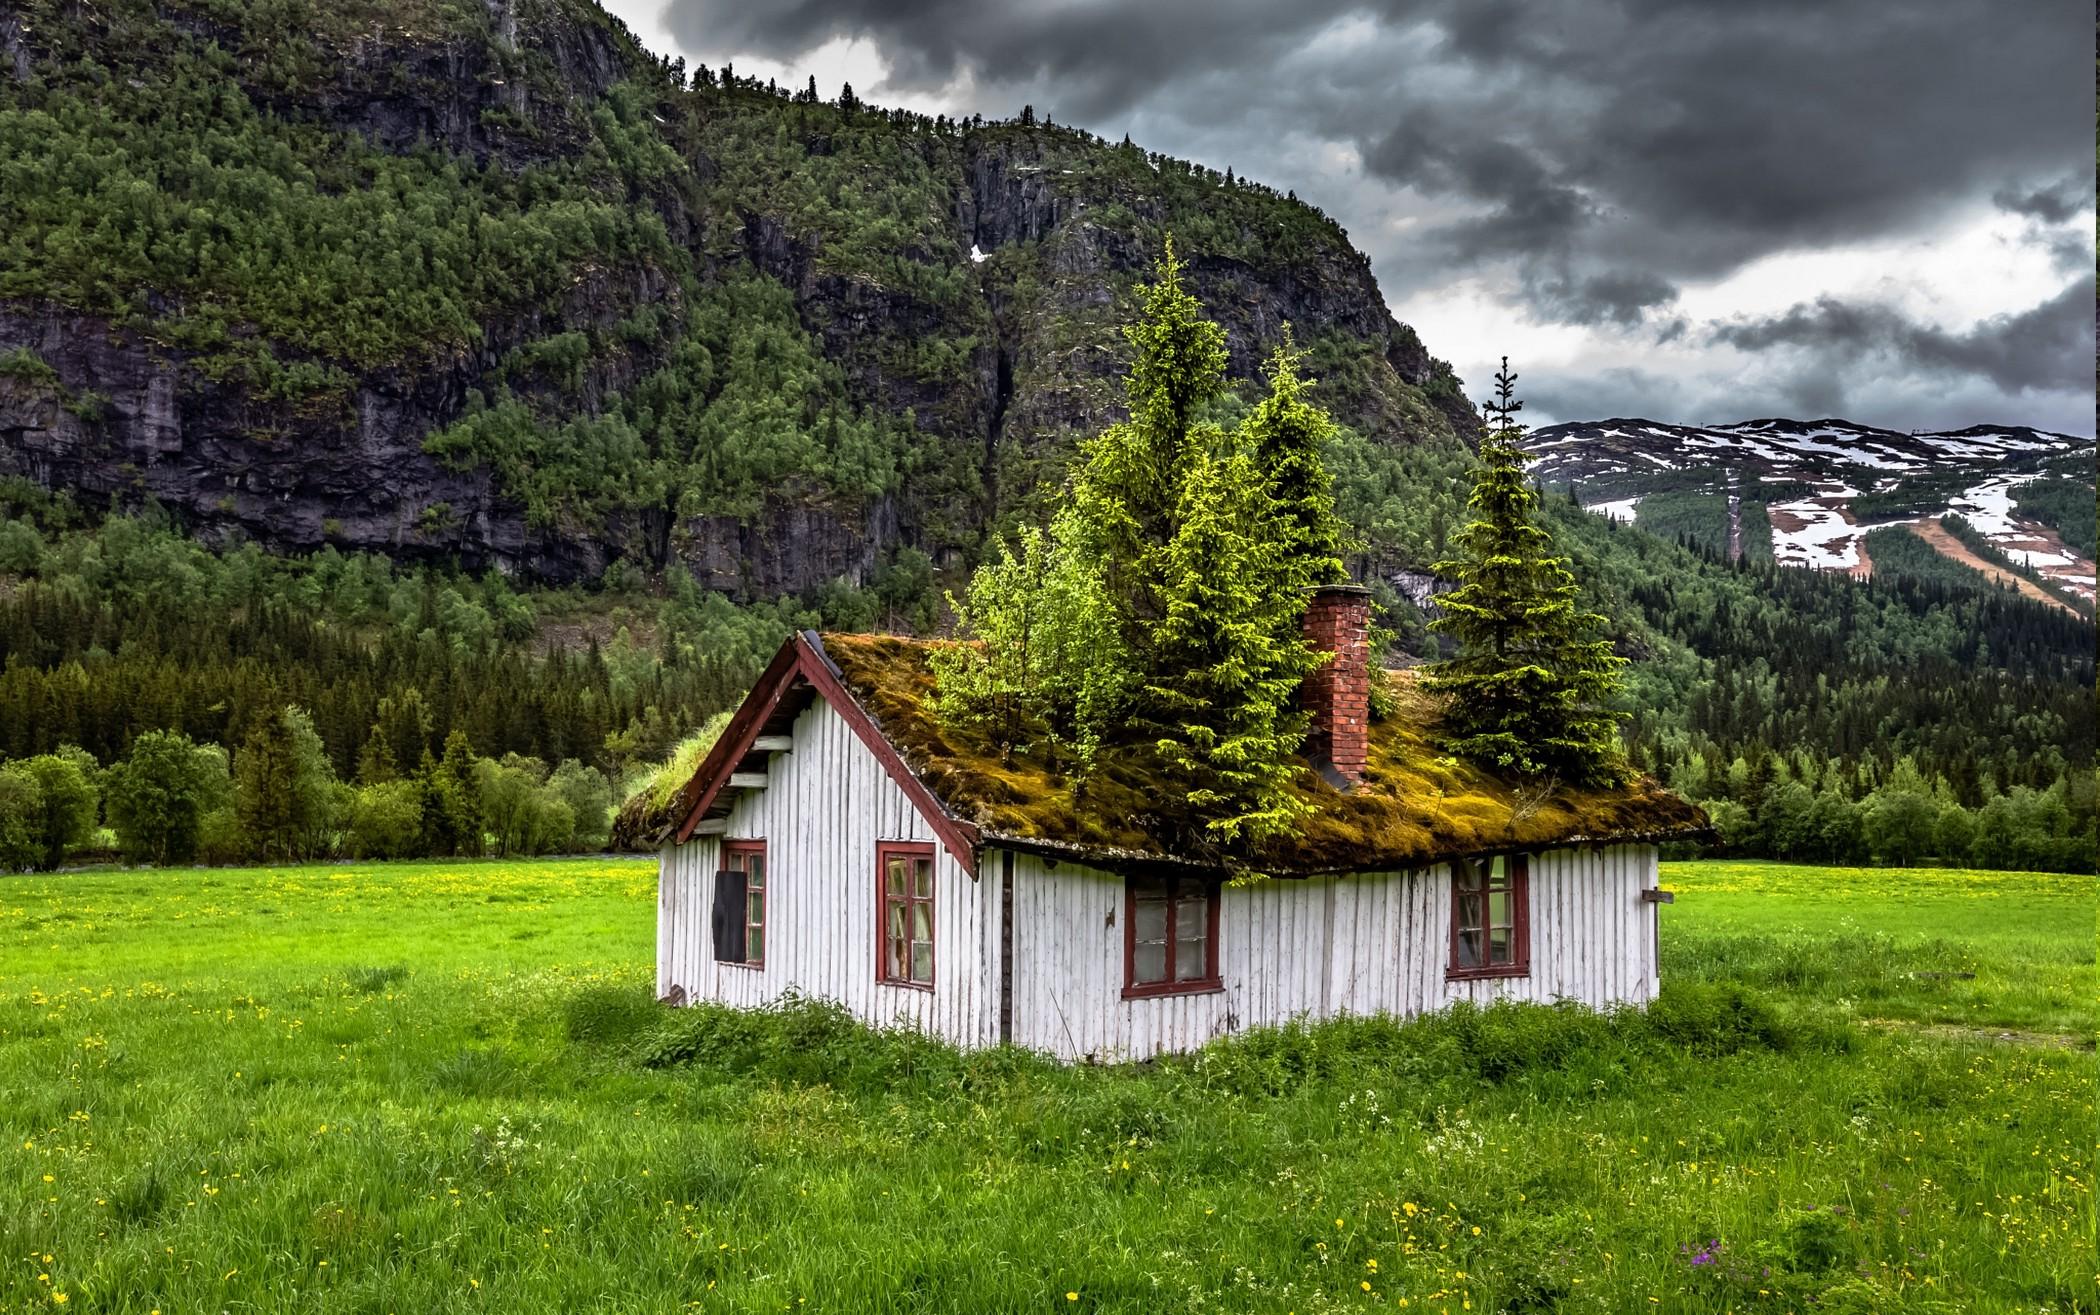 wallpaper : 2100x1315 px, abandoned, clouds, grass, green, house